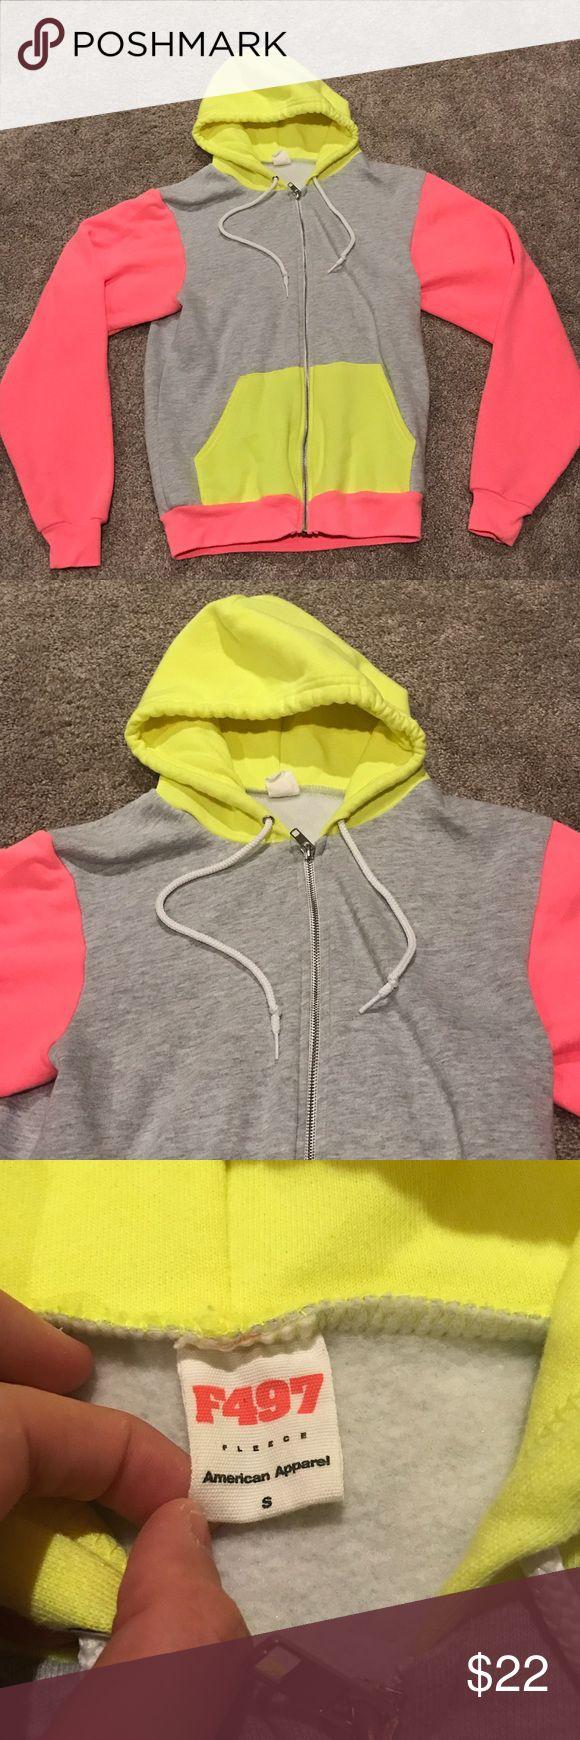 American Apparel Neon Zip Hoodie Neon Pink/ Neon Yellow/ Gray Zip Up Hoodie. Pockets on front. In great condition. American Apparel Tops Sweatshirts & Hoodies